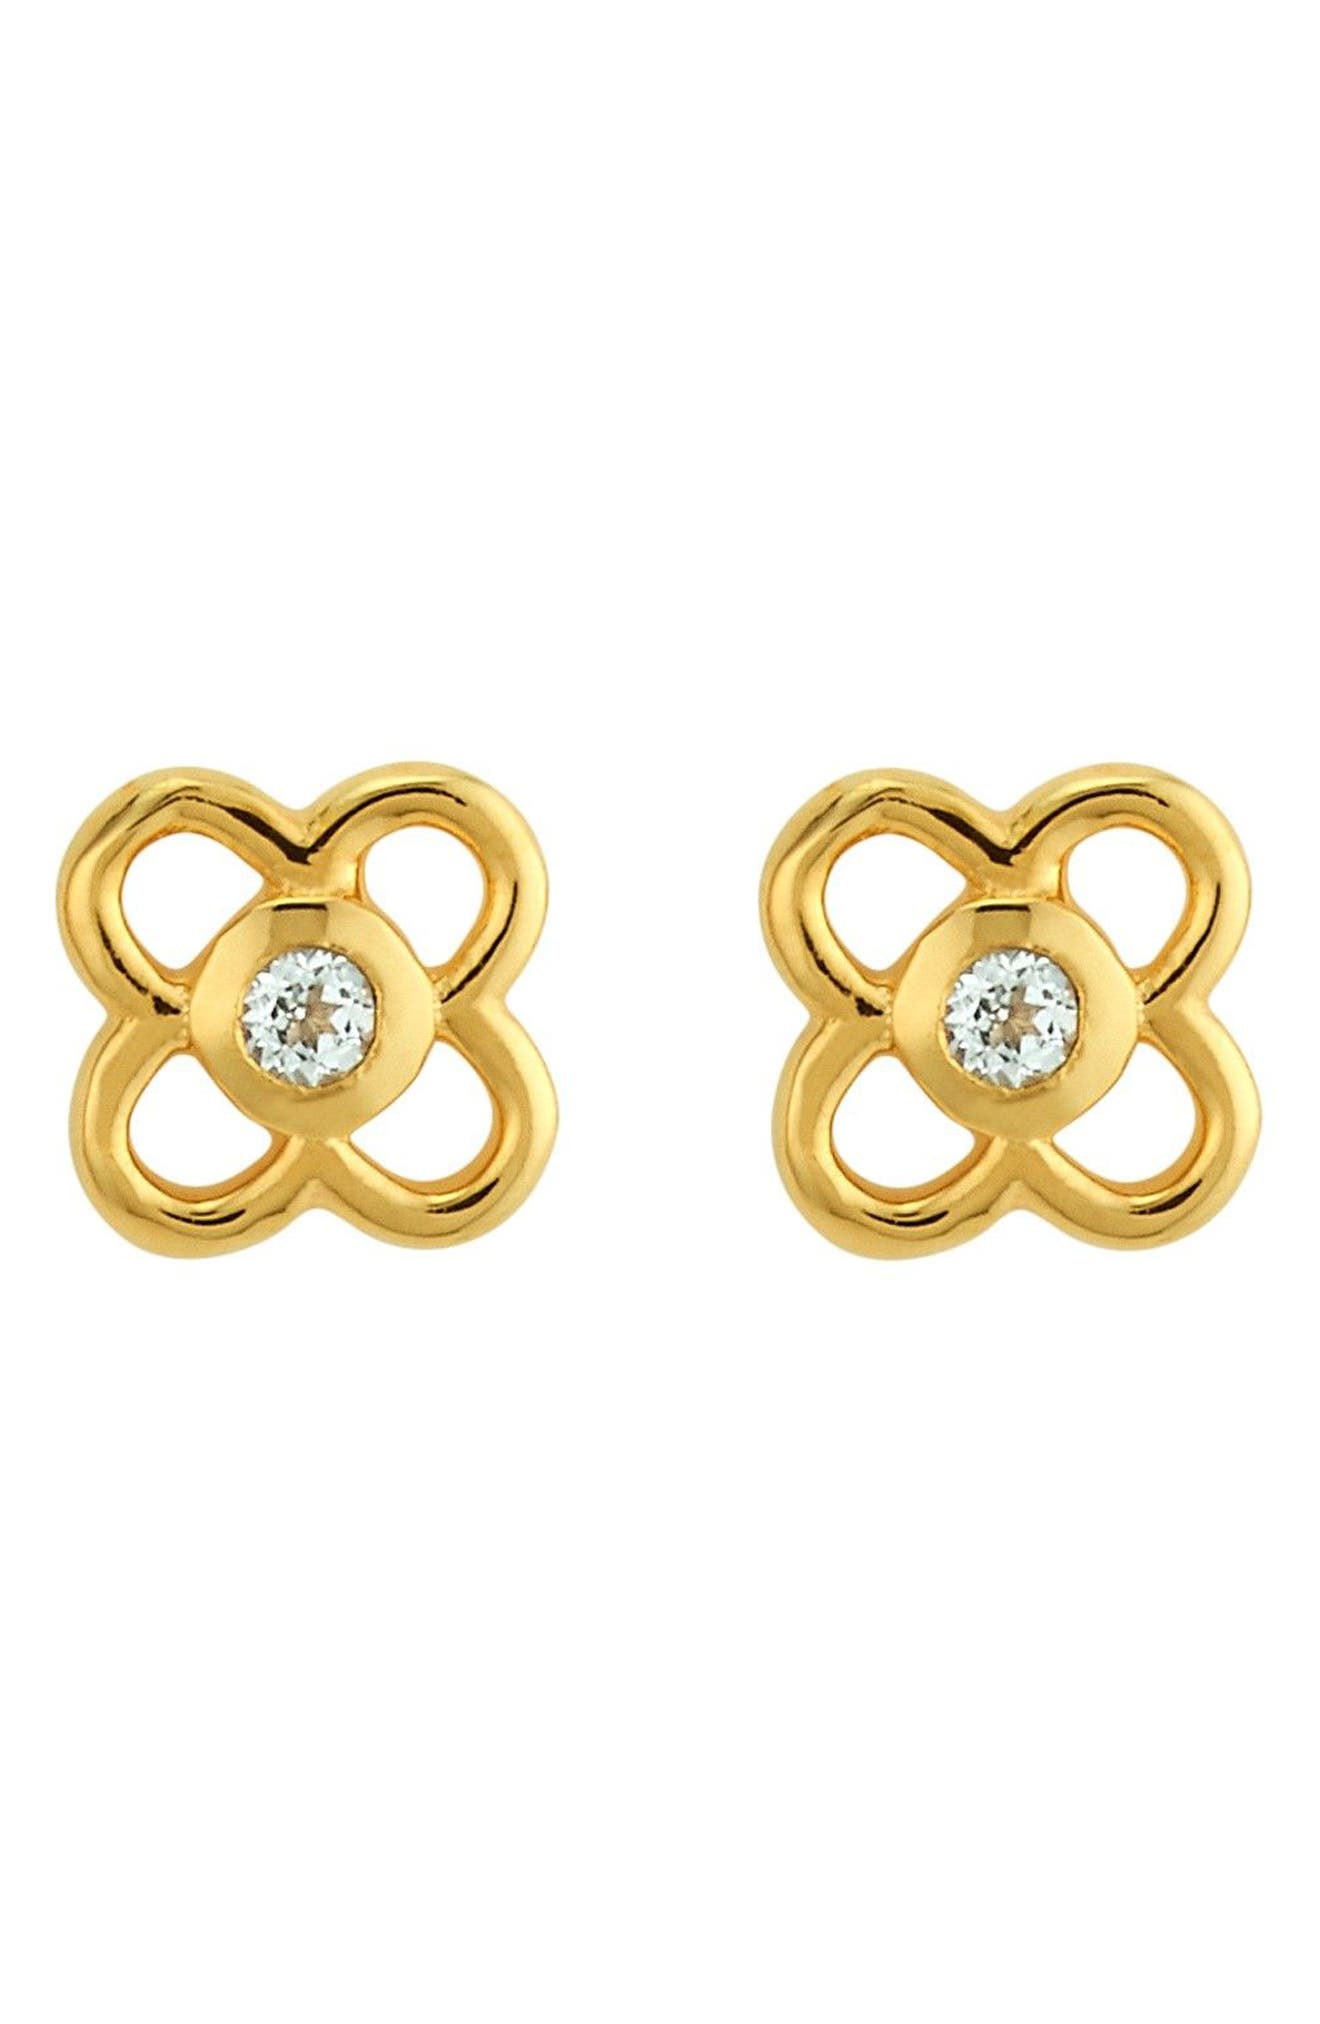 Petite Paloma Stud Earrings,                             Main thumbnail 1, color,                             Crystal/ Gold